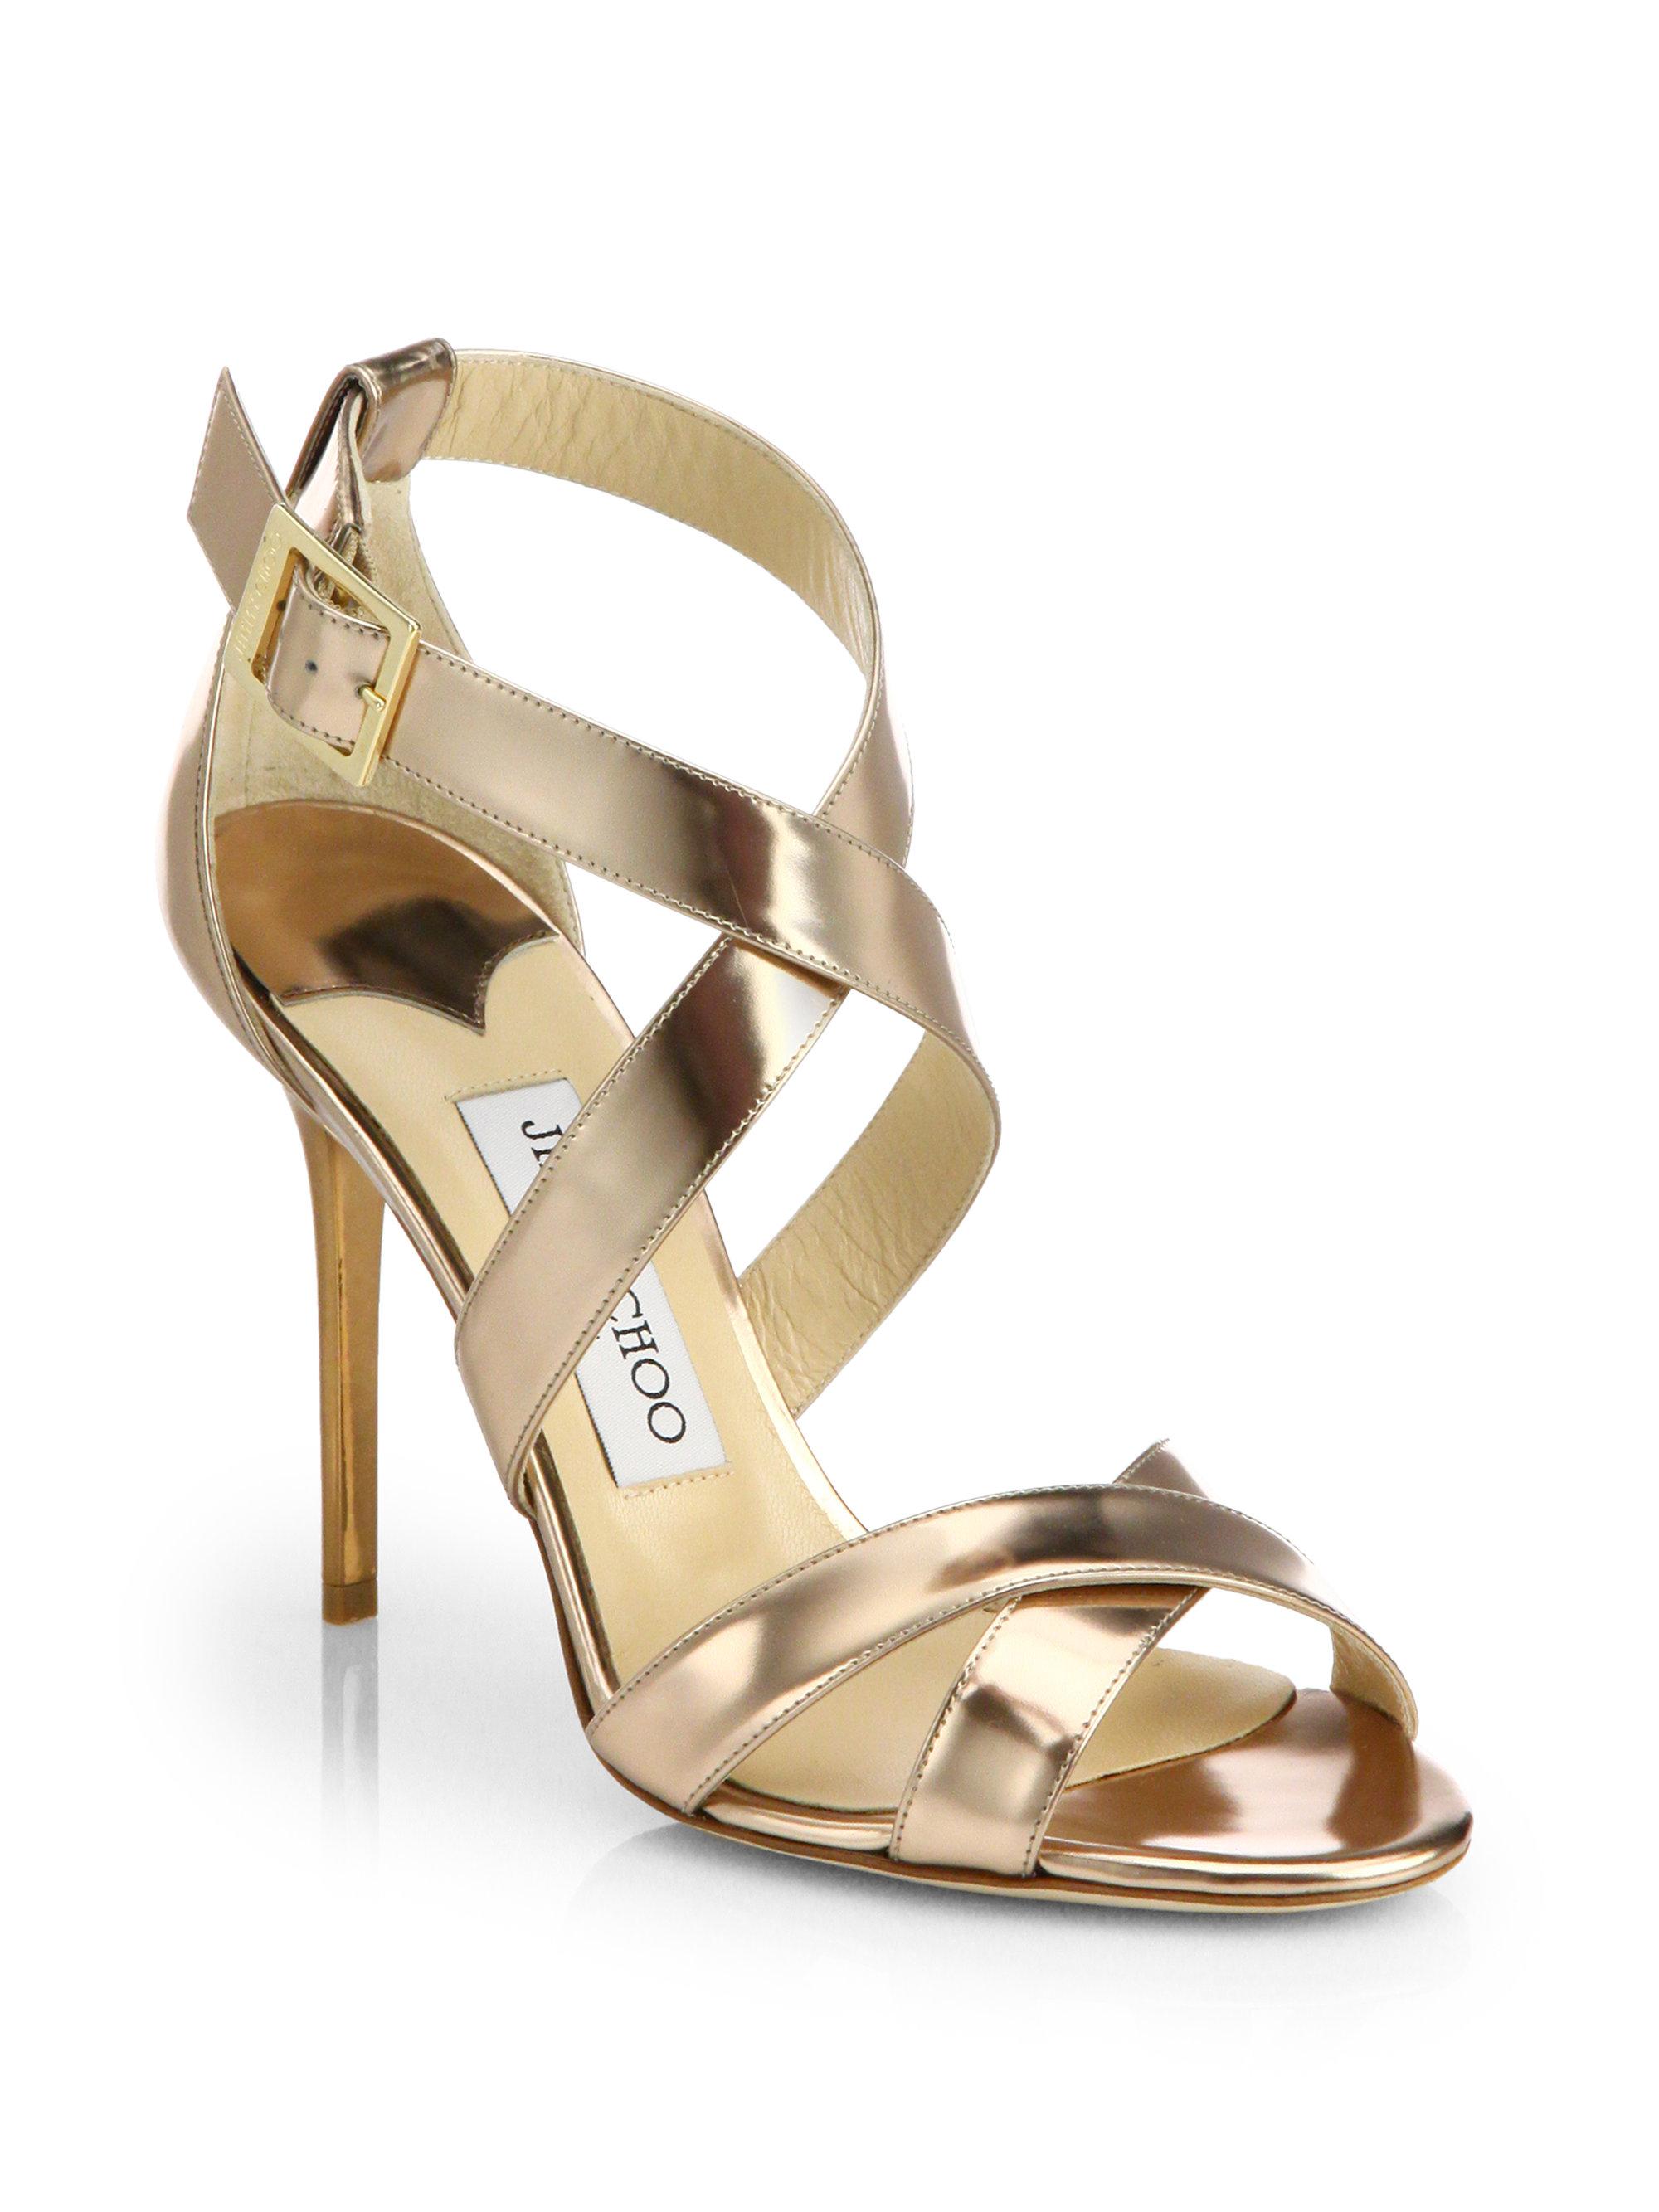 003764197d4 promo code for jimmy choo beige sandals 4e236 70293